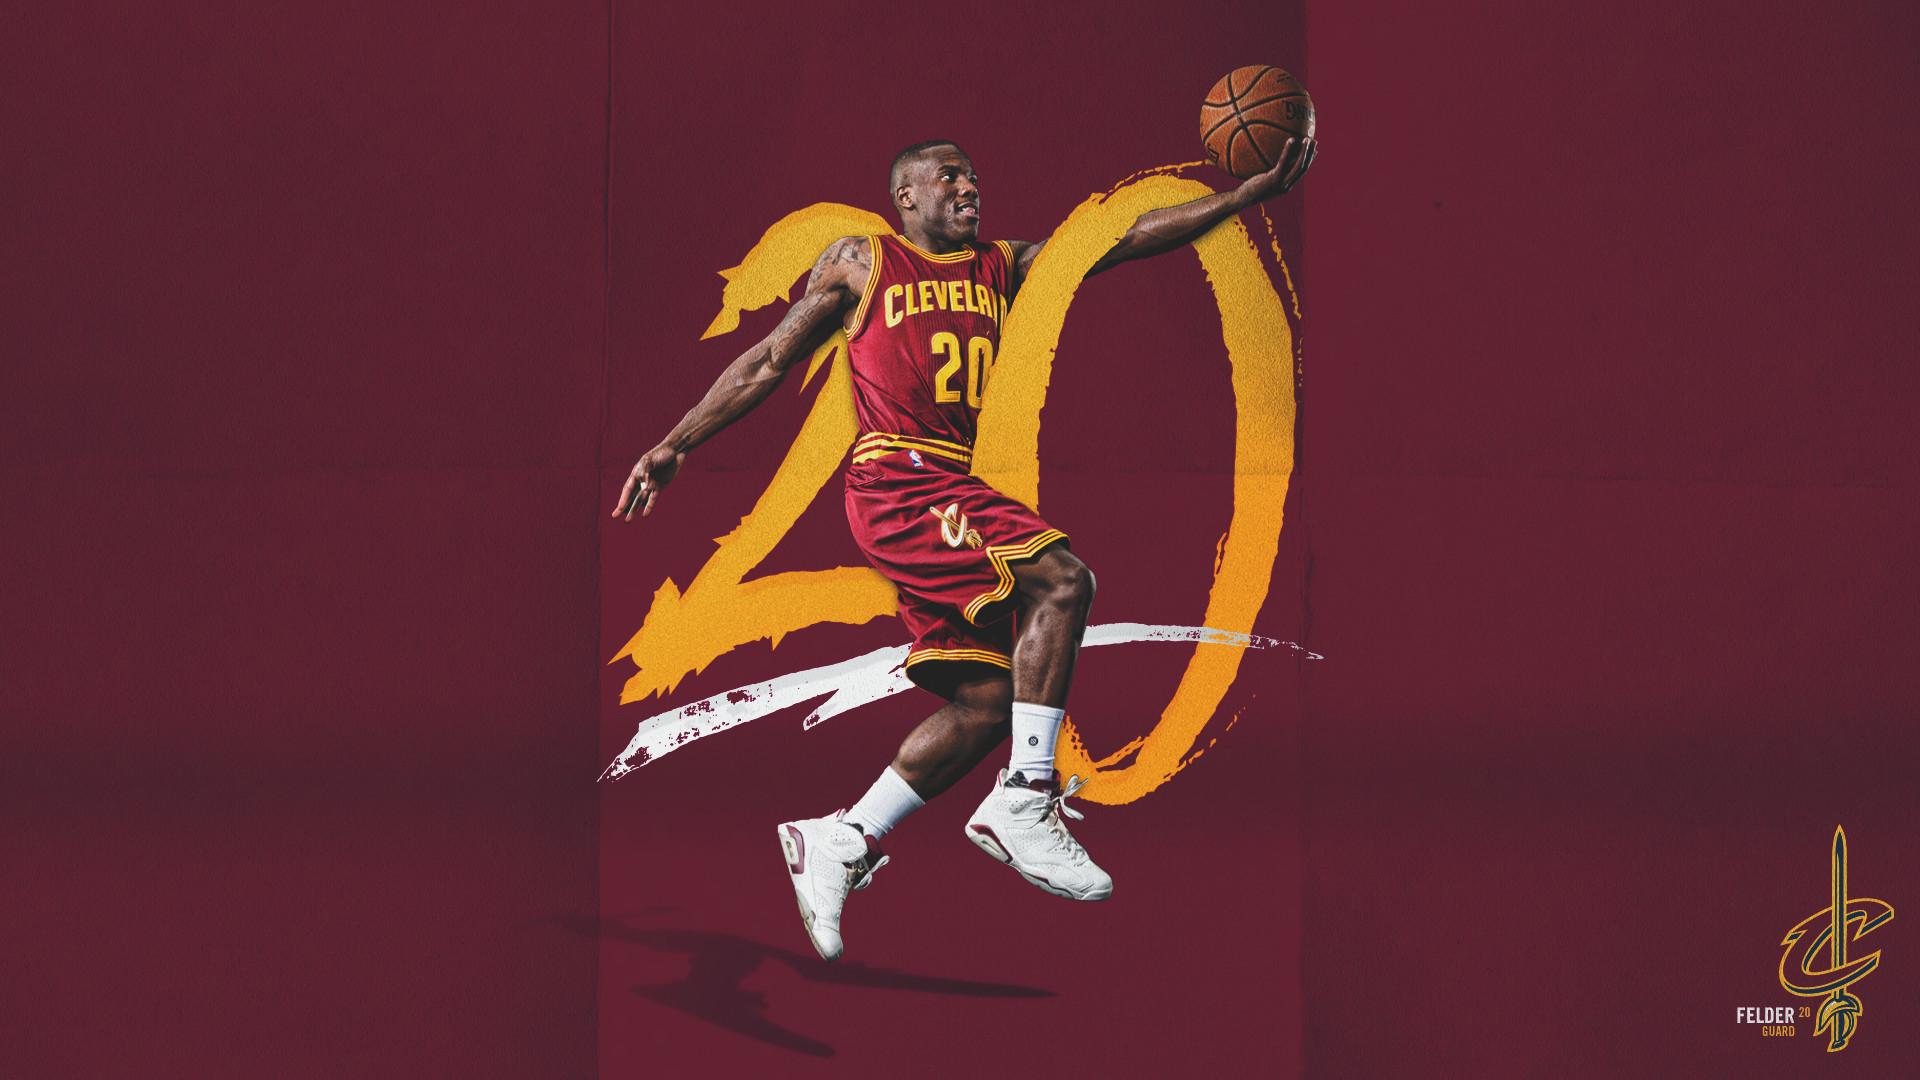 2k Hd Wallpapers: NBA 2K Wallpapers (81+ Images